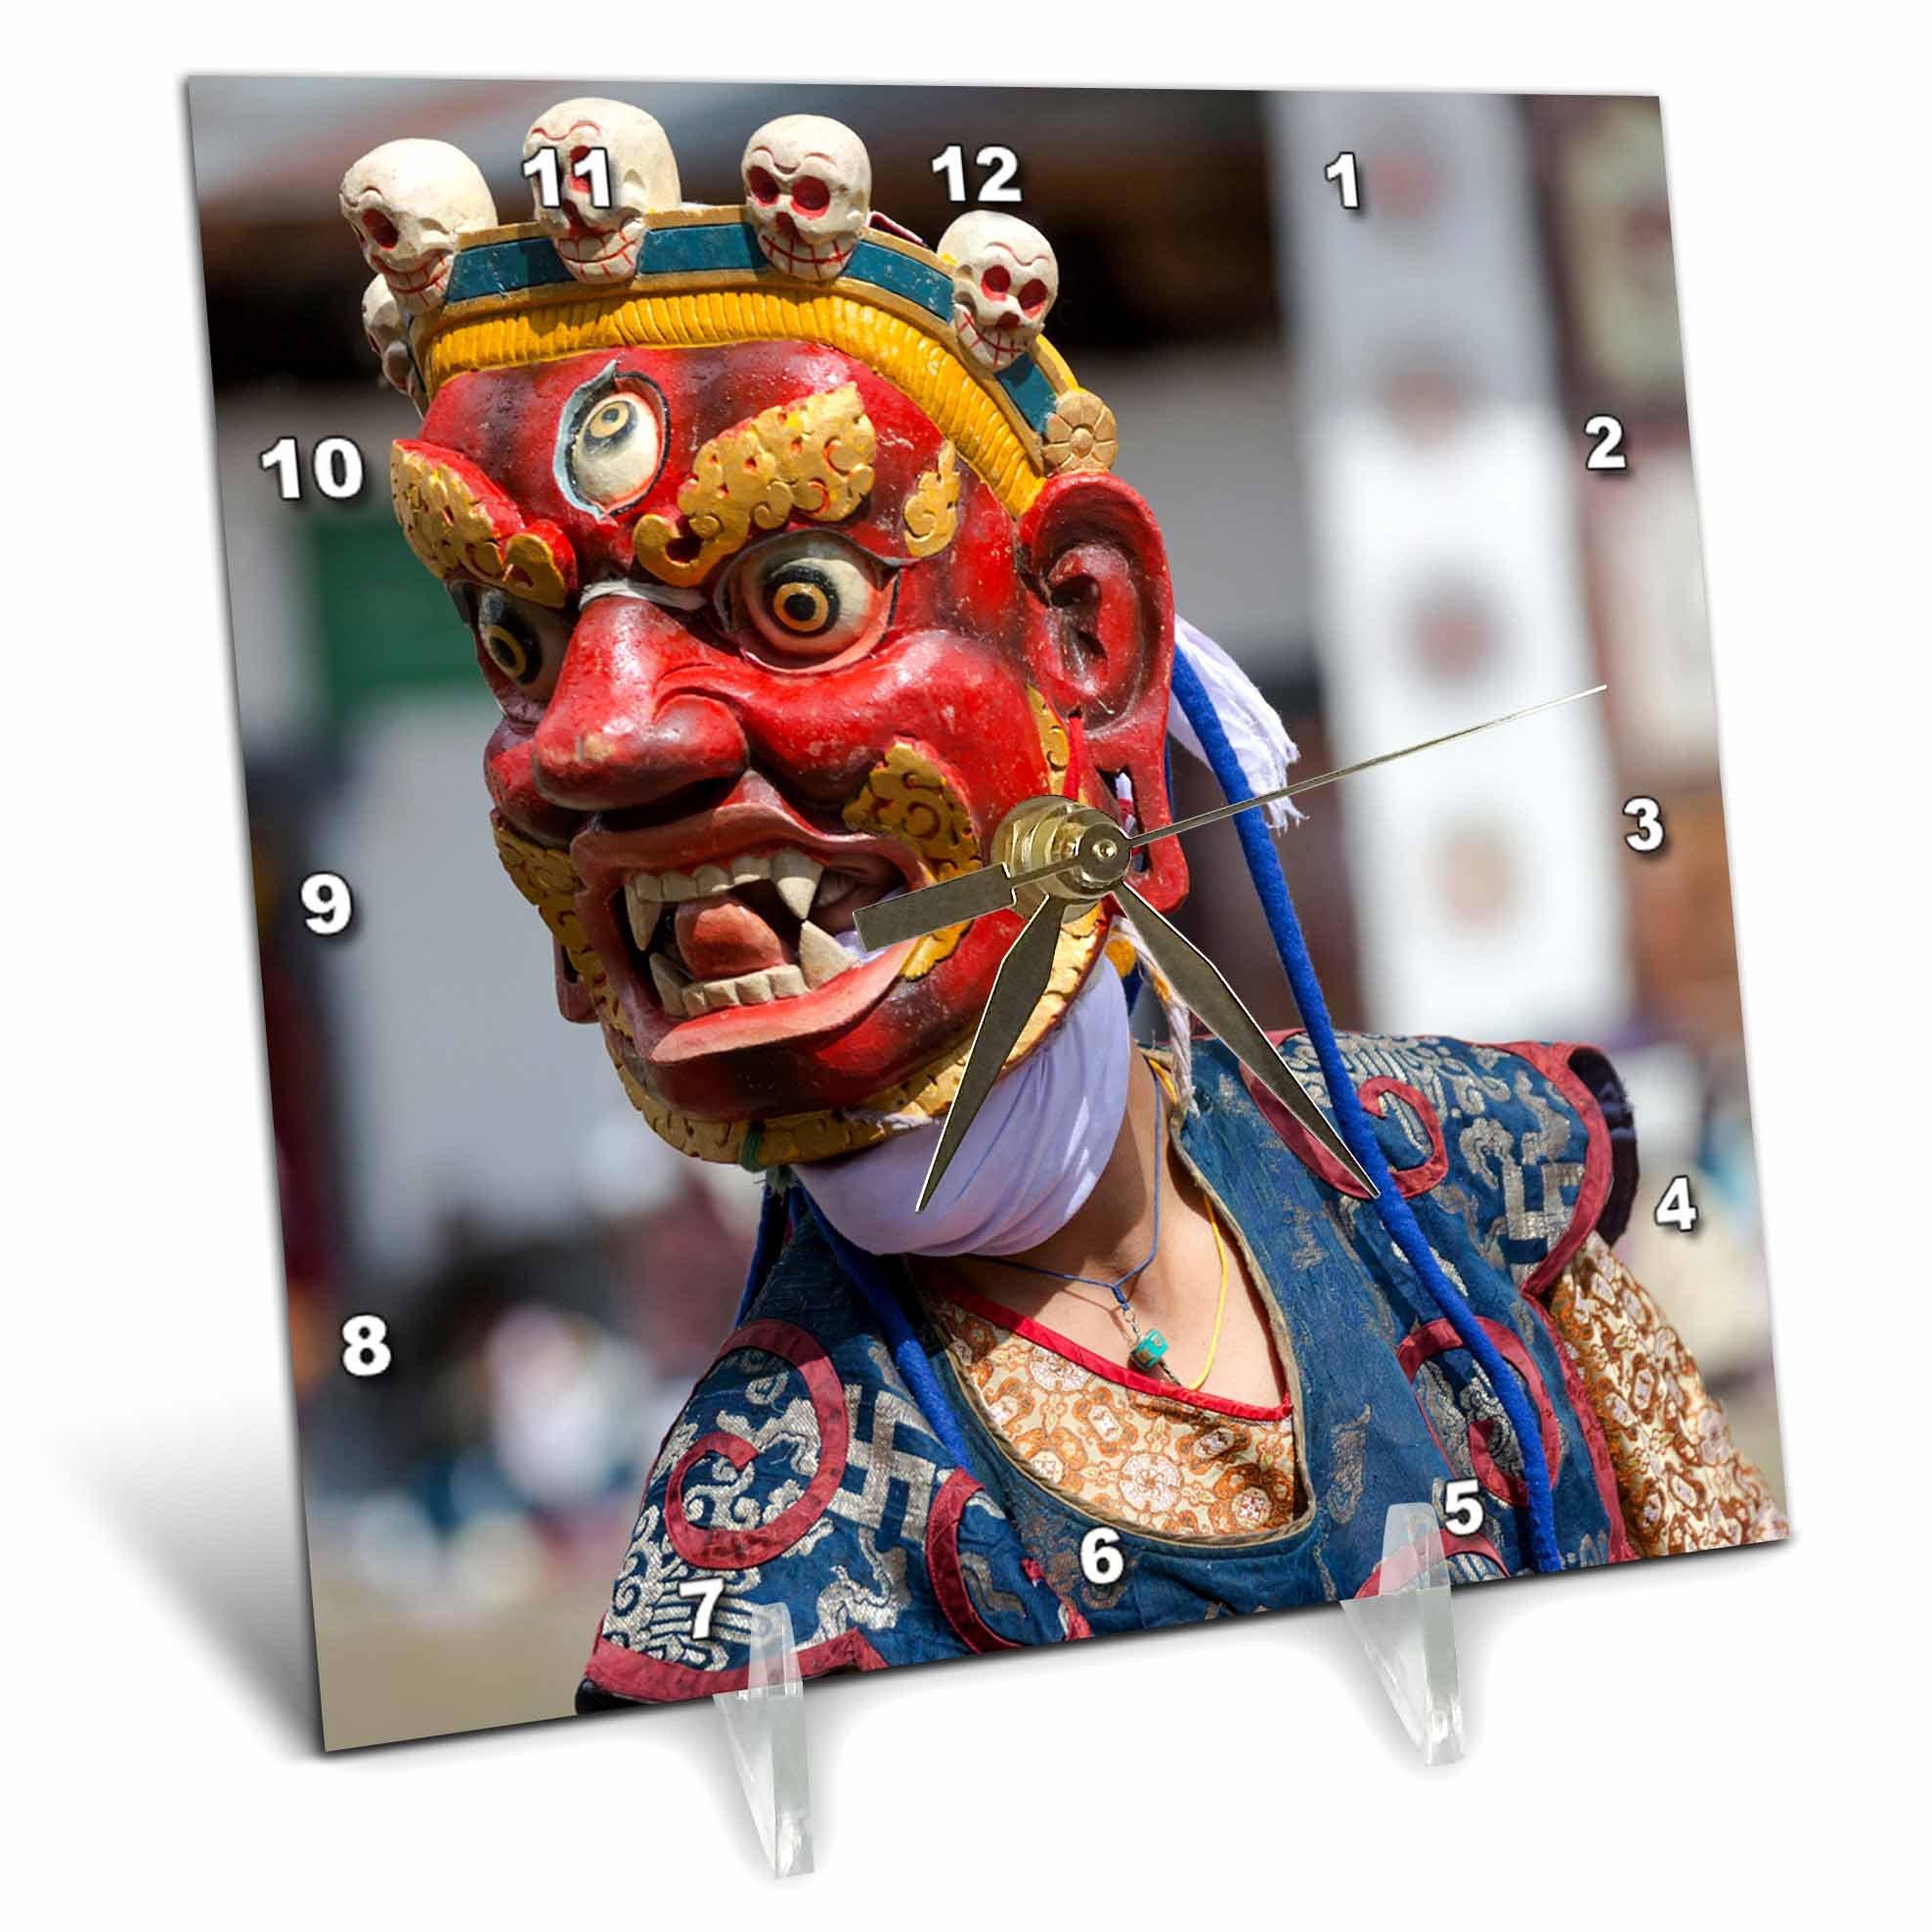 3dRose Danita Delimont - People - Asia, Bhutan, Gangtey Gonpa. Dance of the Furies. - 6x6 Desk Clock (dc_257041_1) by 3dRose (Image #1)